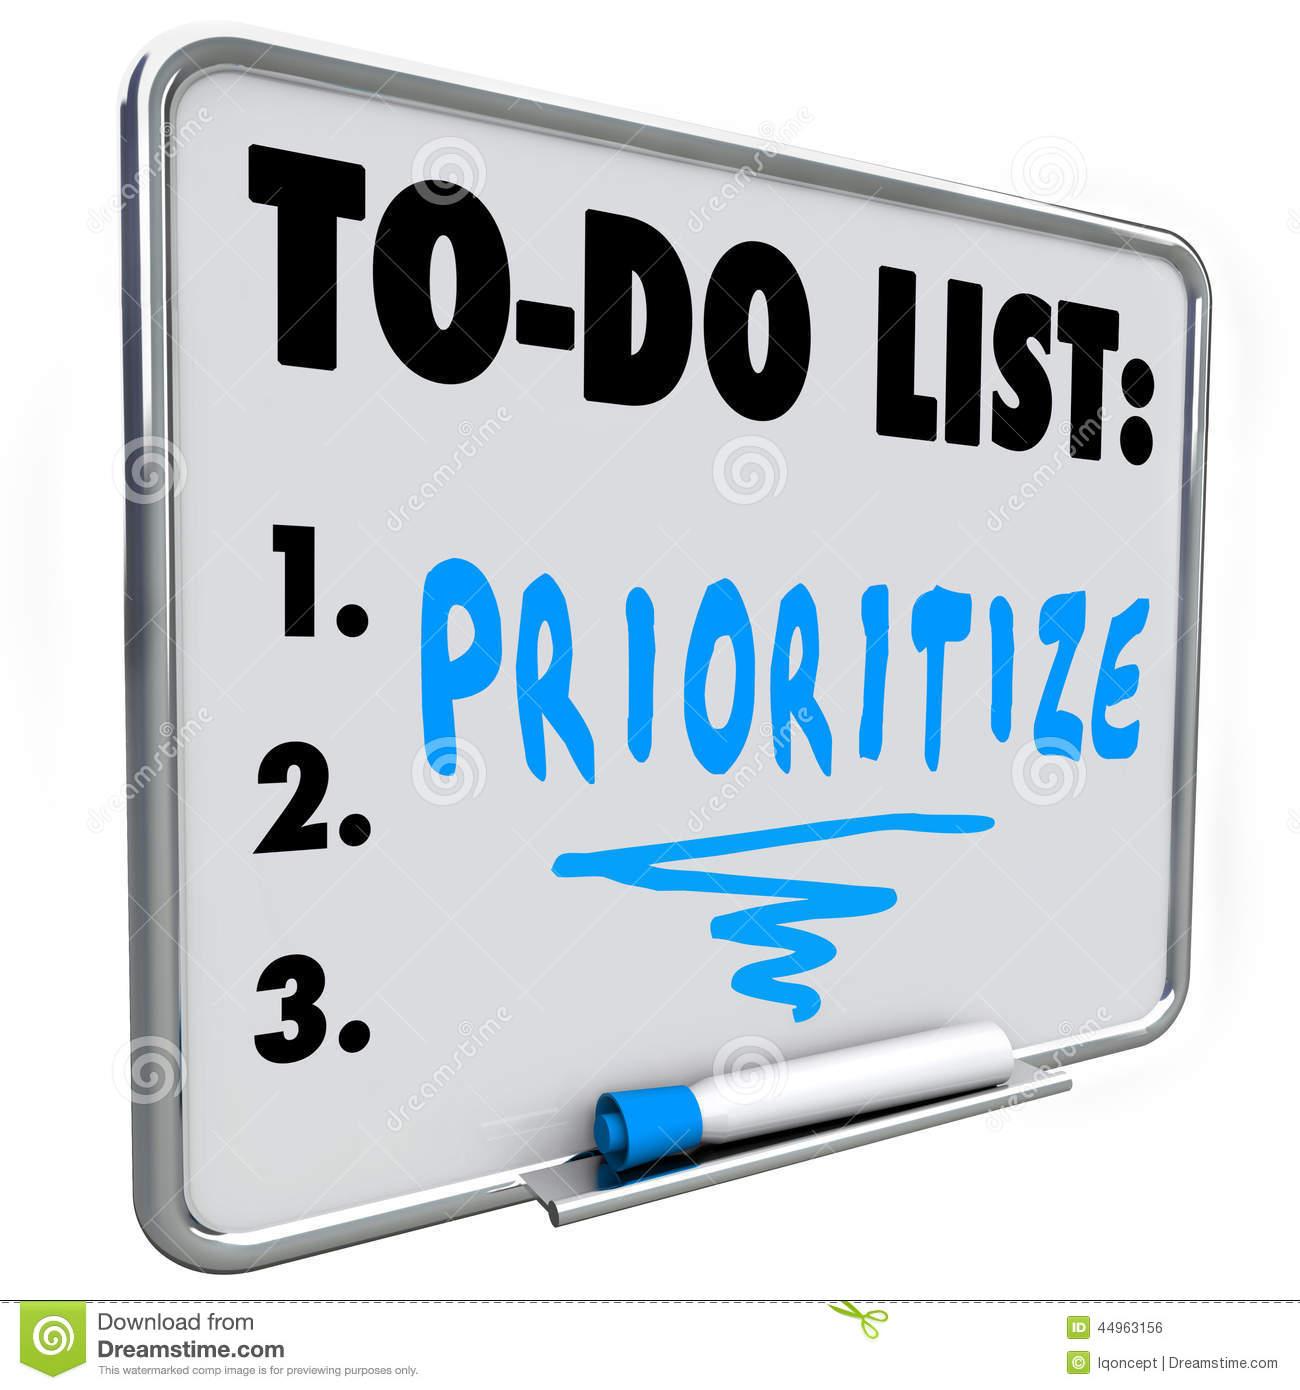 Task List Clipart.